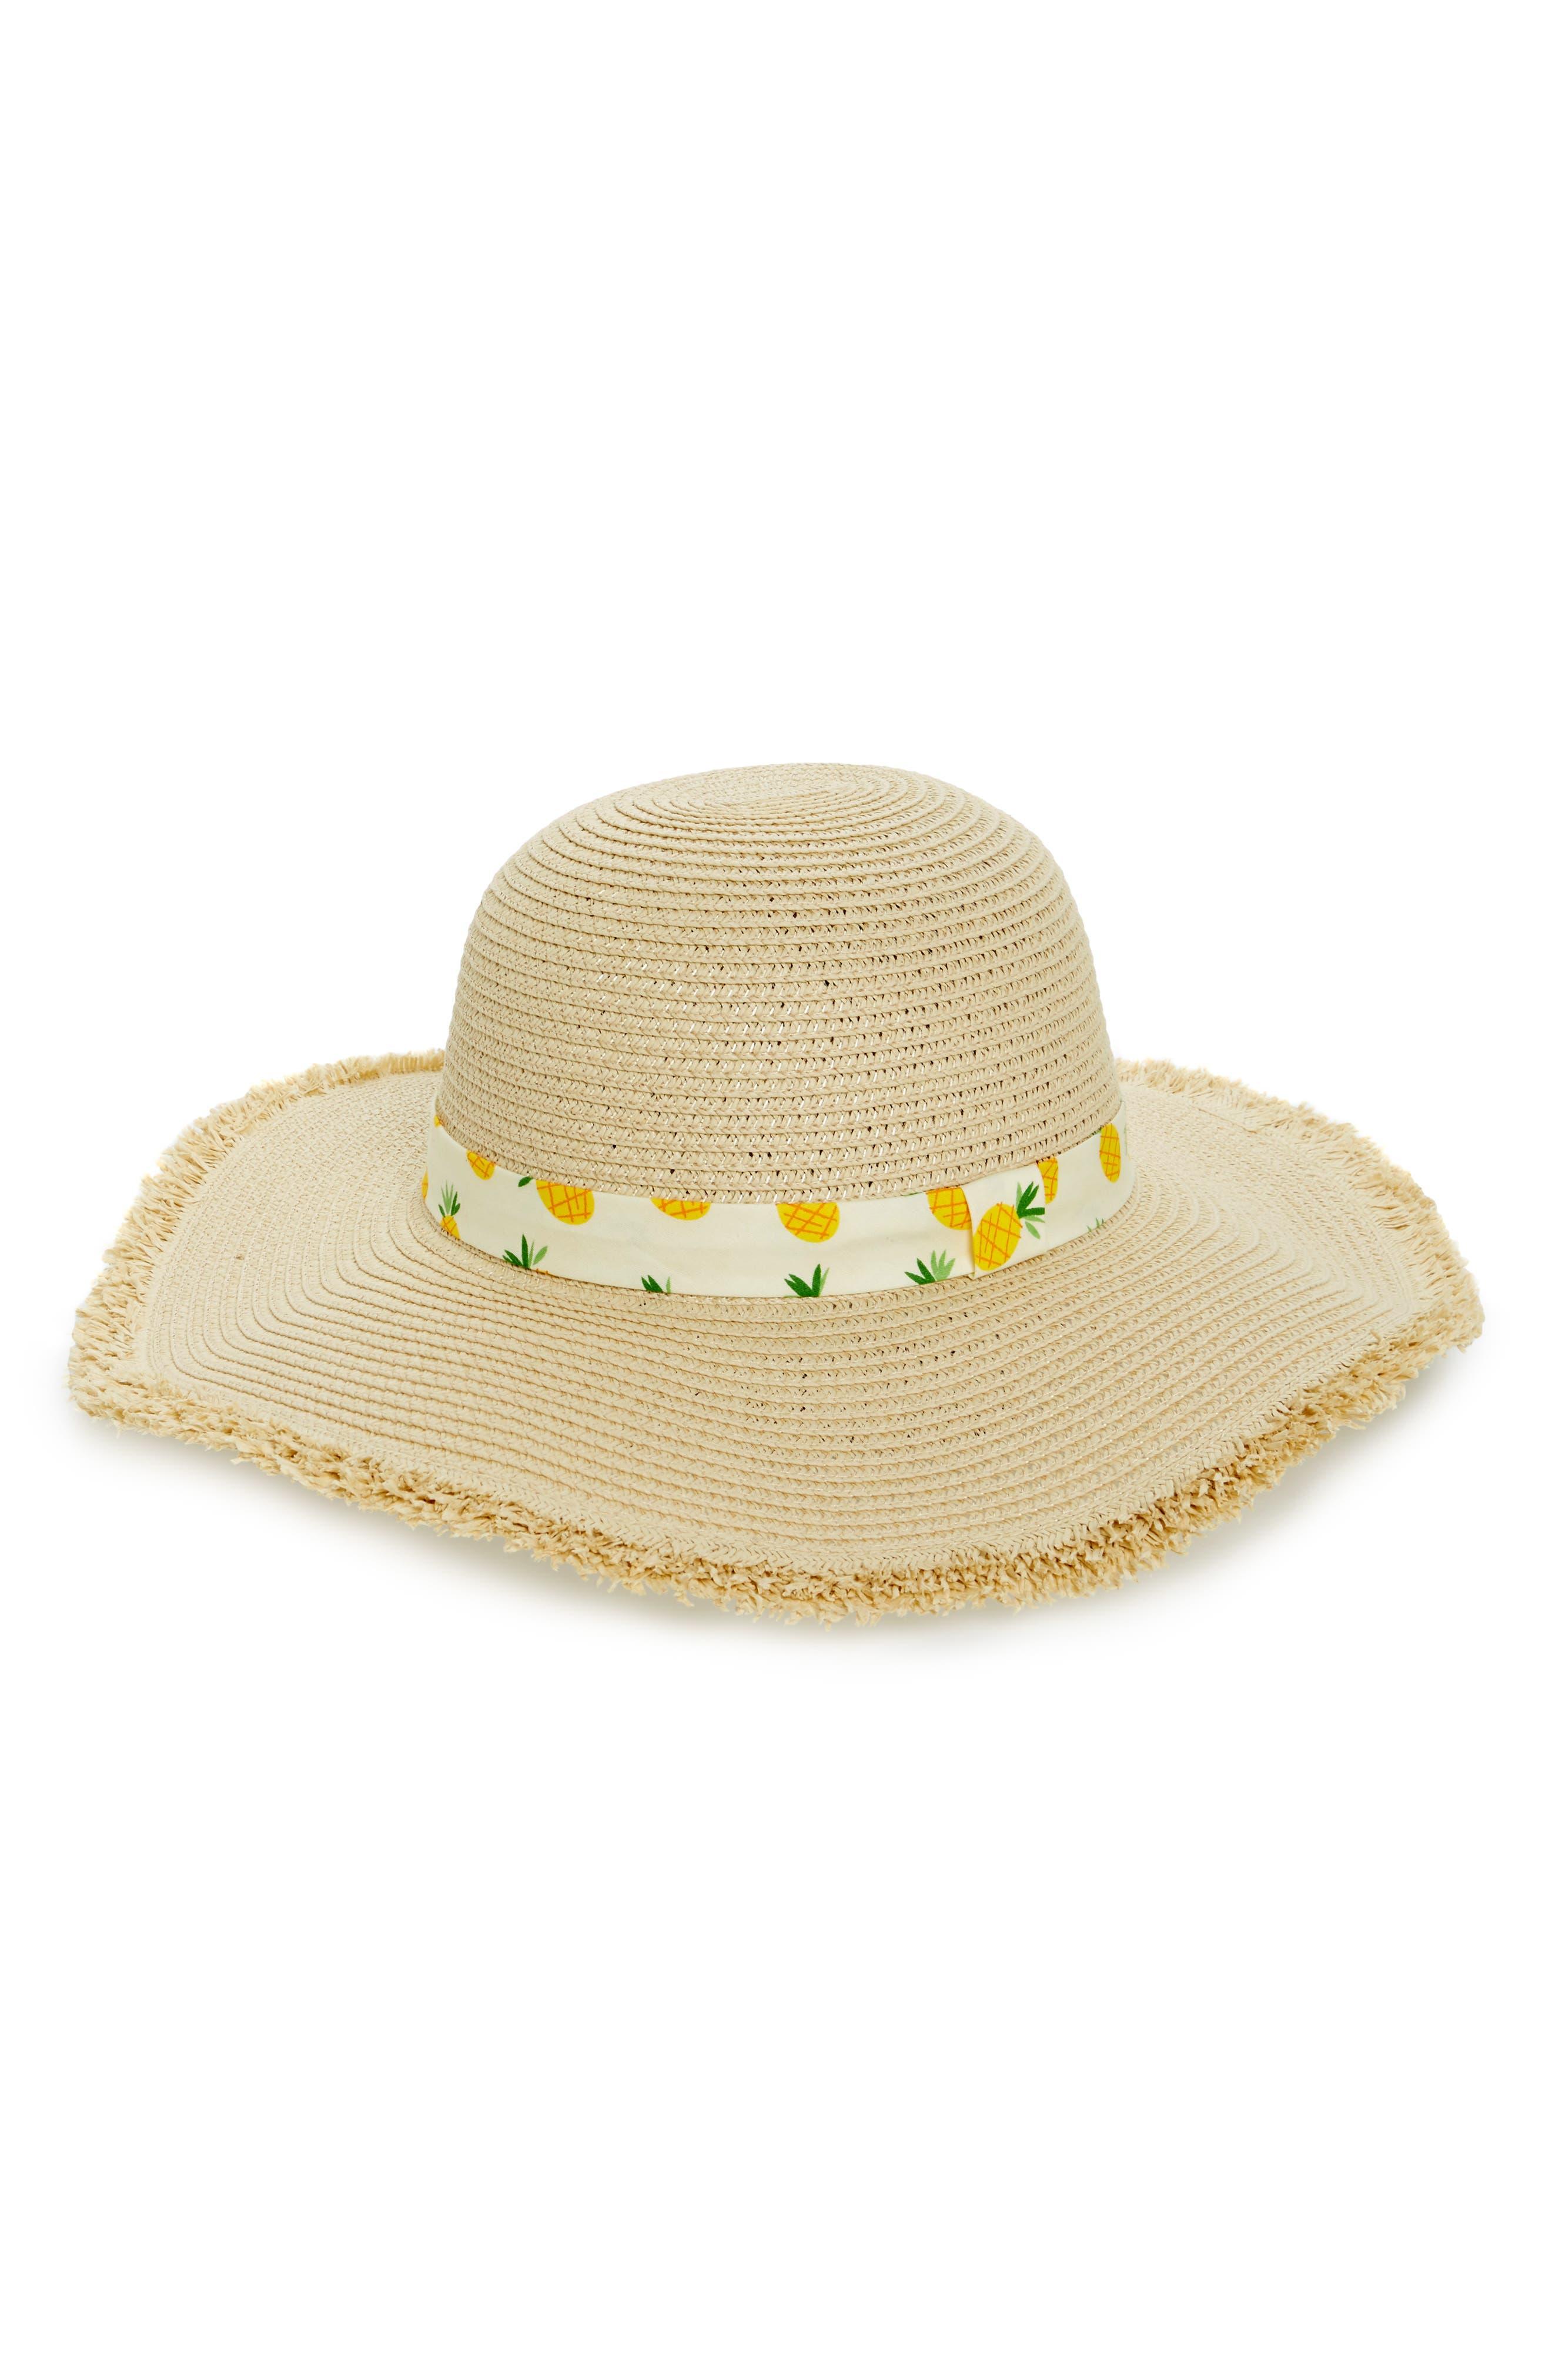 Alternate Image 1 Selected - BP. Novelty Band Floppy Straw Hat